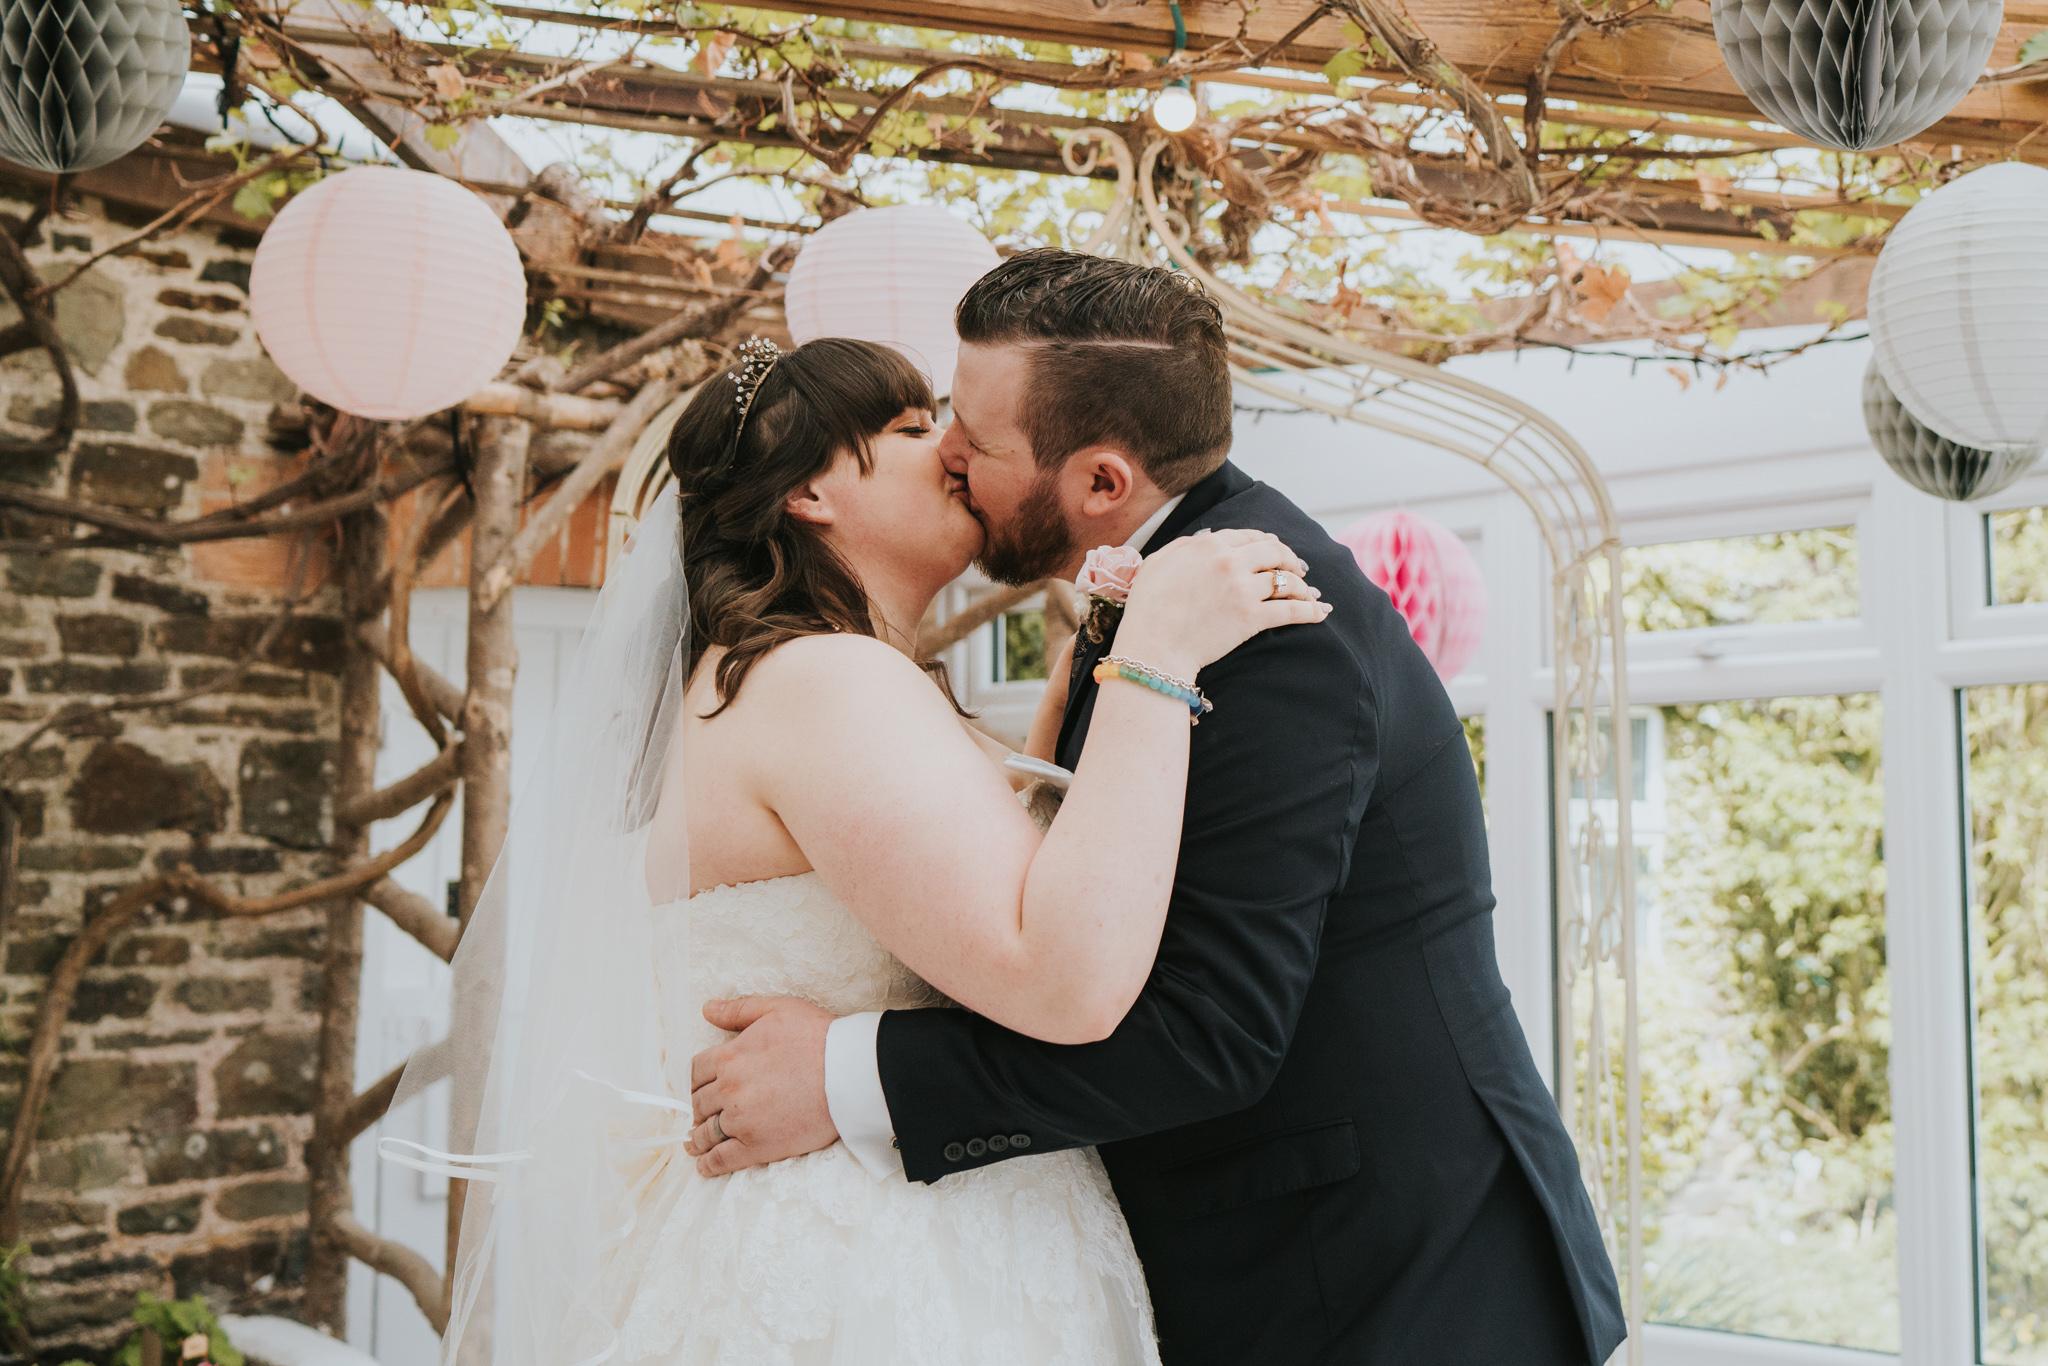 grace-sam-old-barn-clovelly-devon-wedding-photographer-grace-elizabeth-essex-suffolk-norfolk-wedding-photographer (61 of 132).jpg